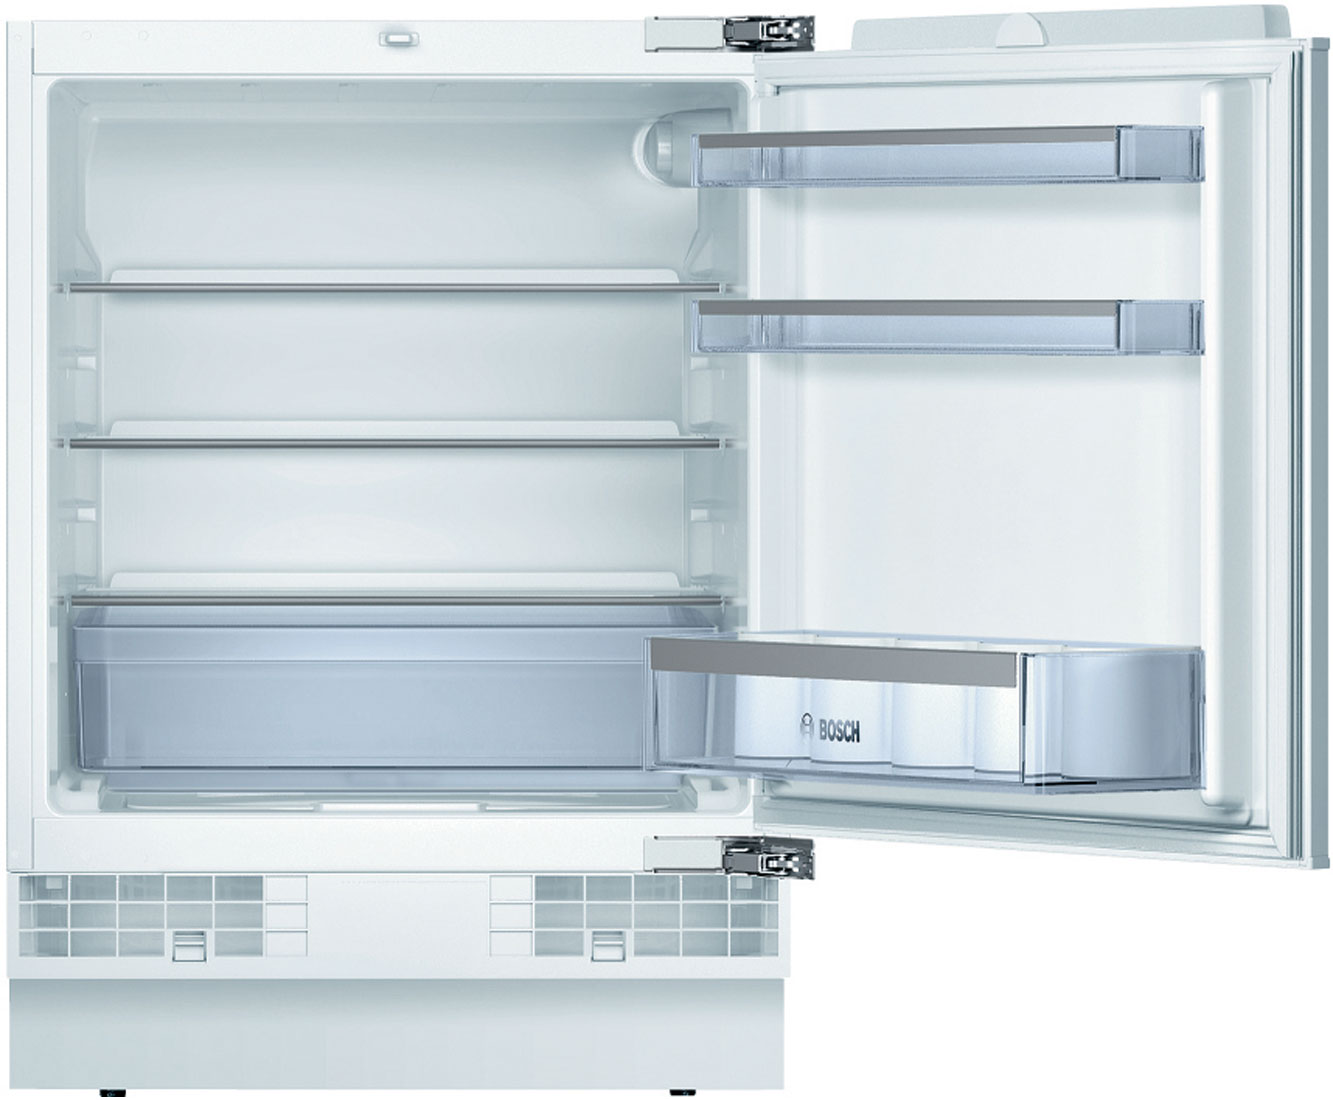 KUR15A50GB | Bosch Integrated Larder Fridge | ao.com